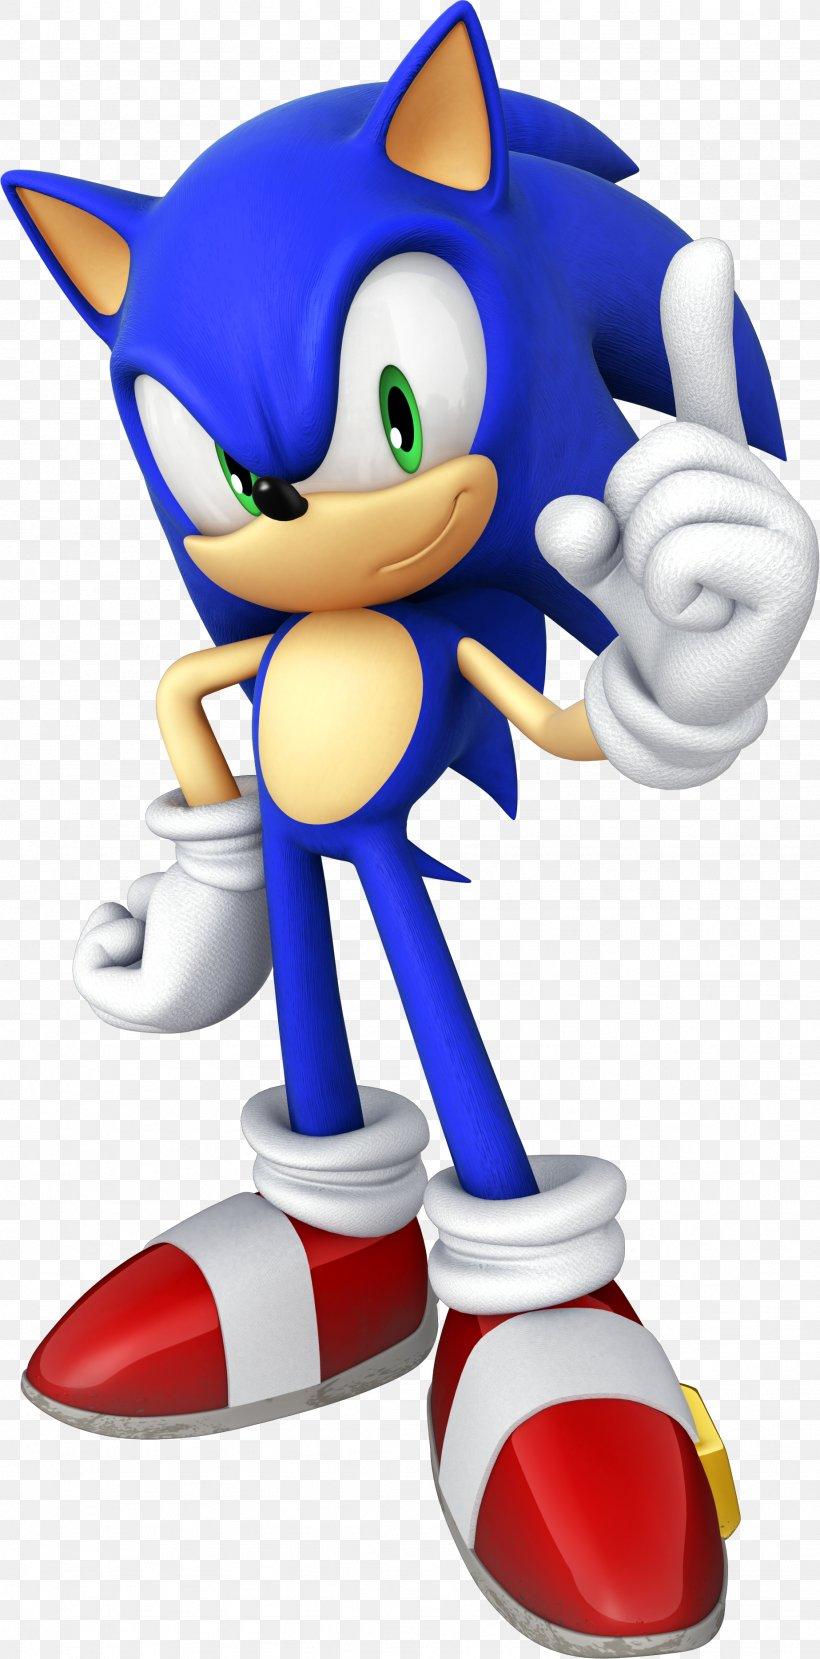 Sonic The Hedgehog 2 Doctor Eggman Sonic The Hedgehog 3 Film Png